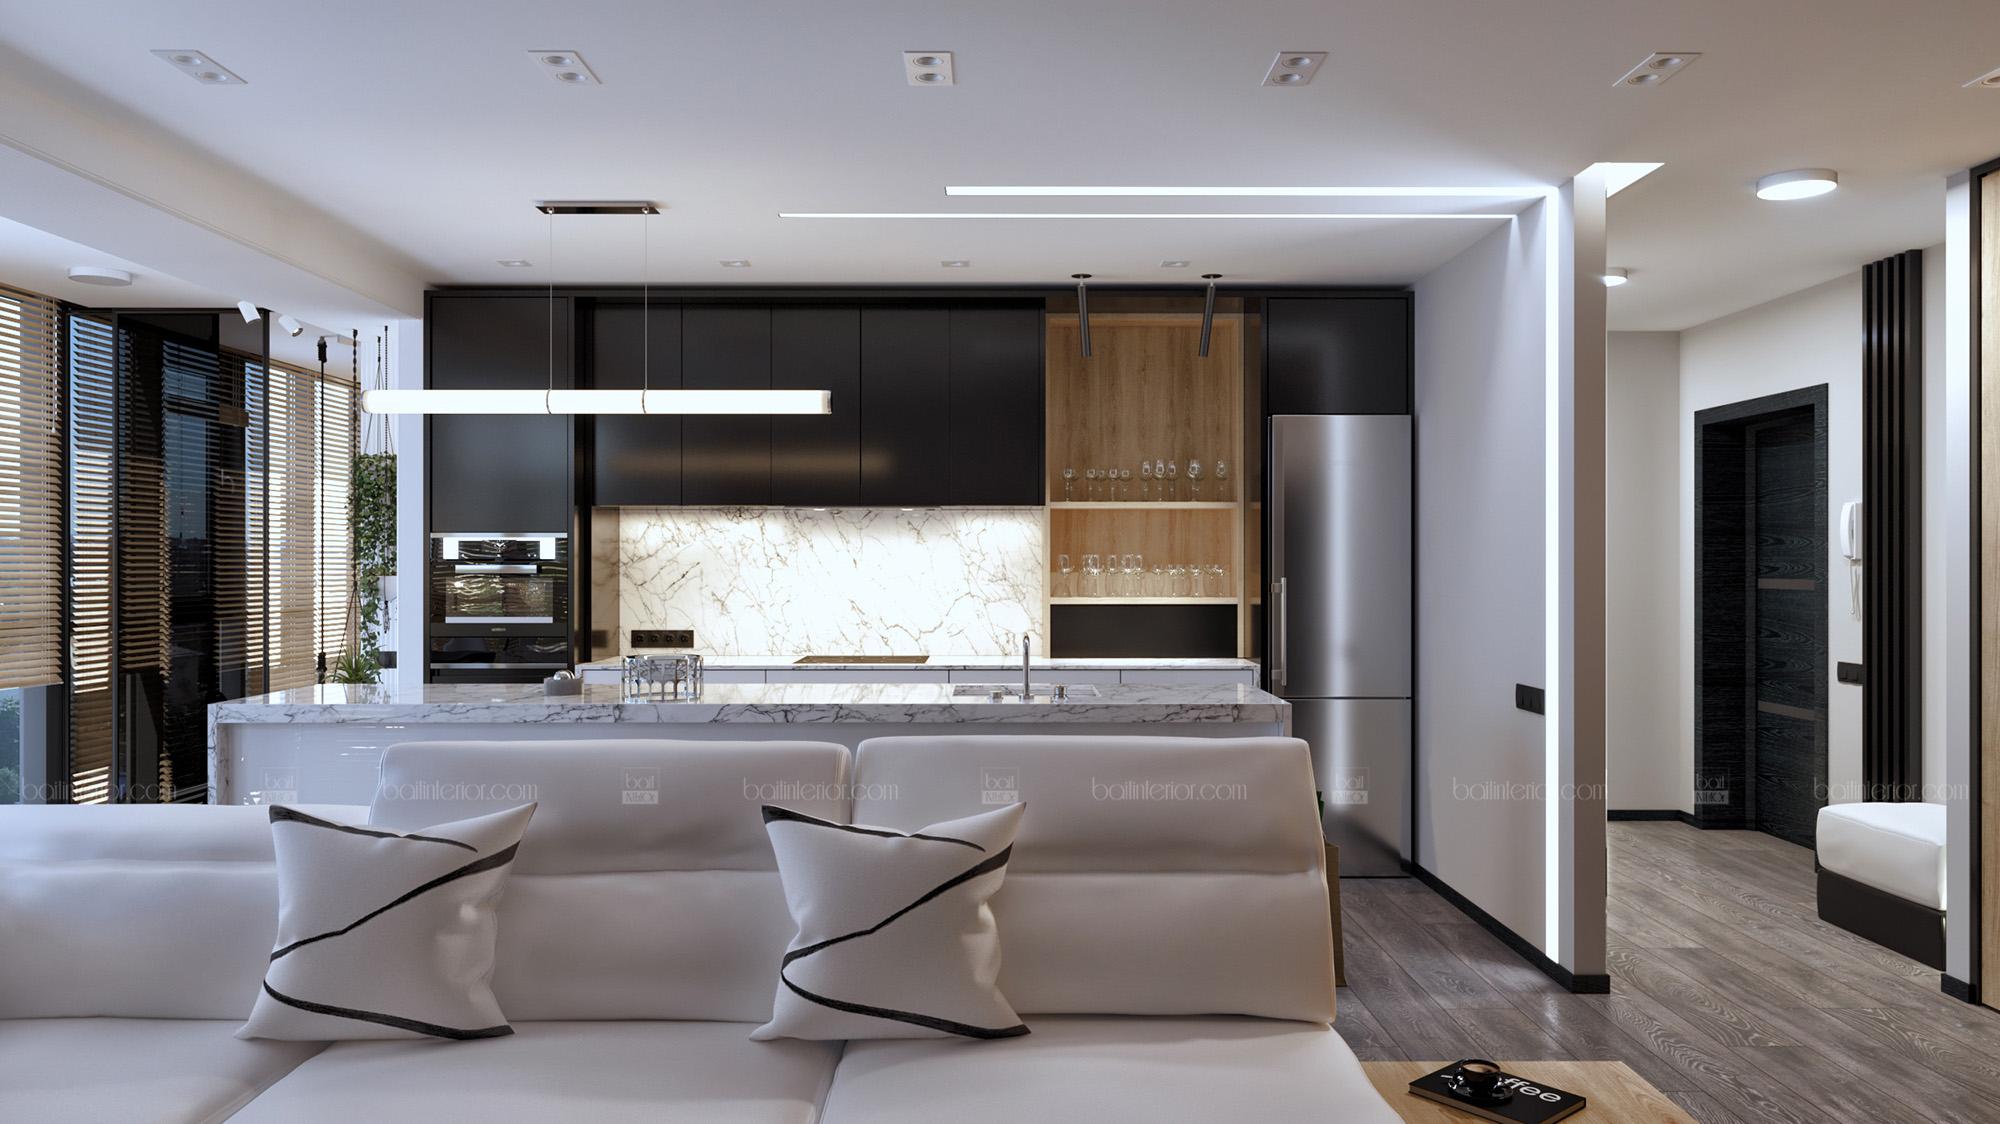 Дизайн интерьера квартиры в стиле минимализм.